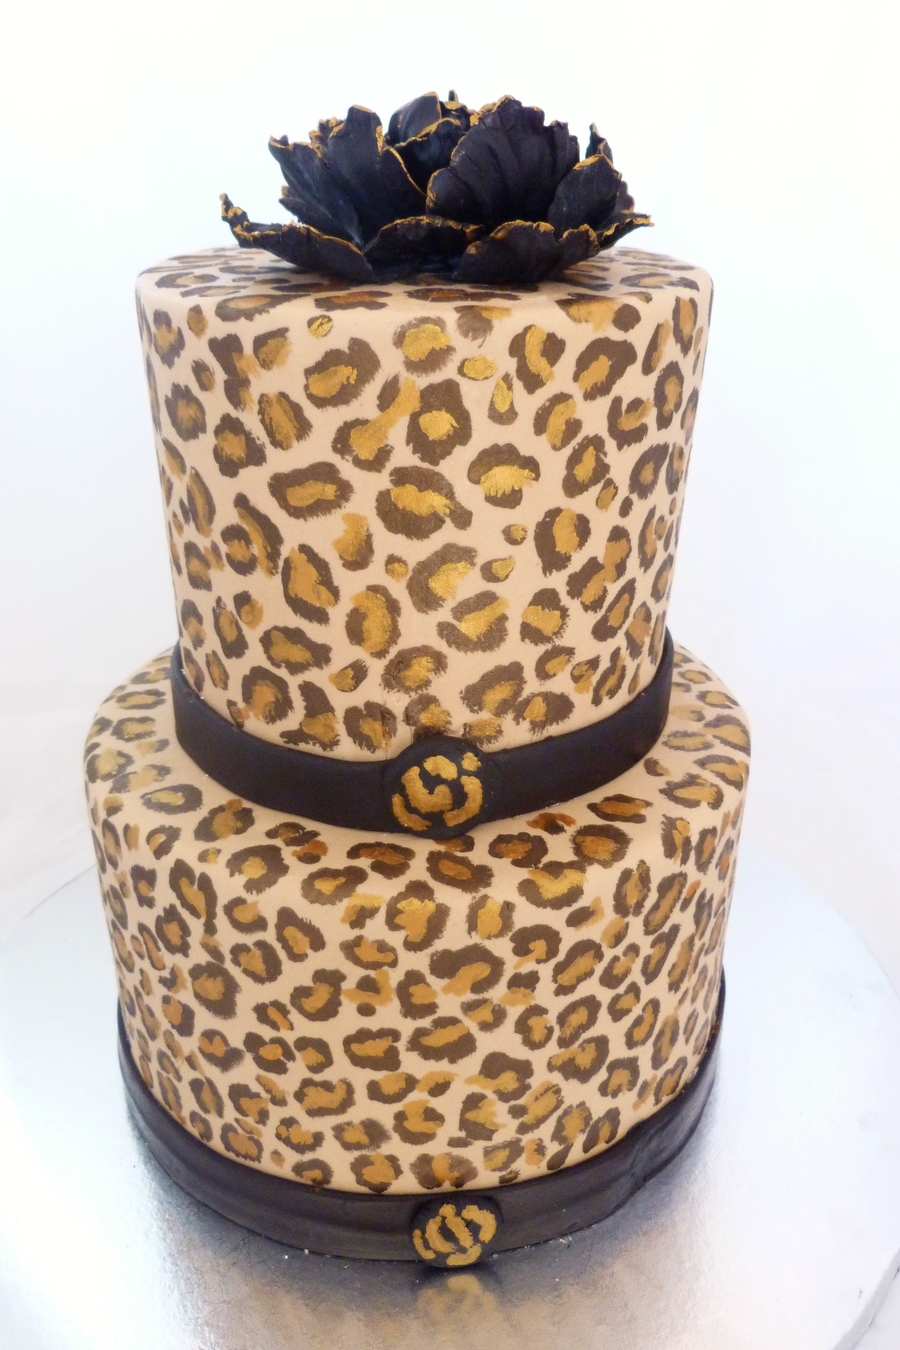 Cute Birthday Cake Wallpaper Handpainted Cheetah Print Cake Cakecentral Com